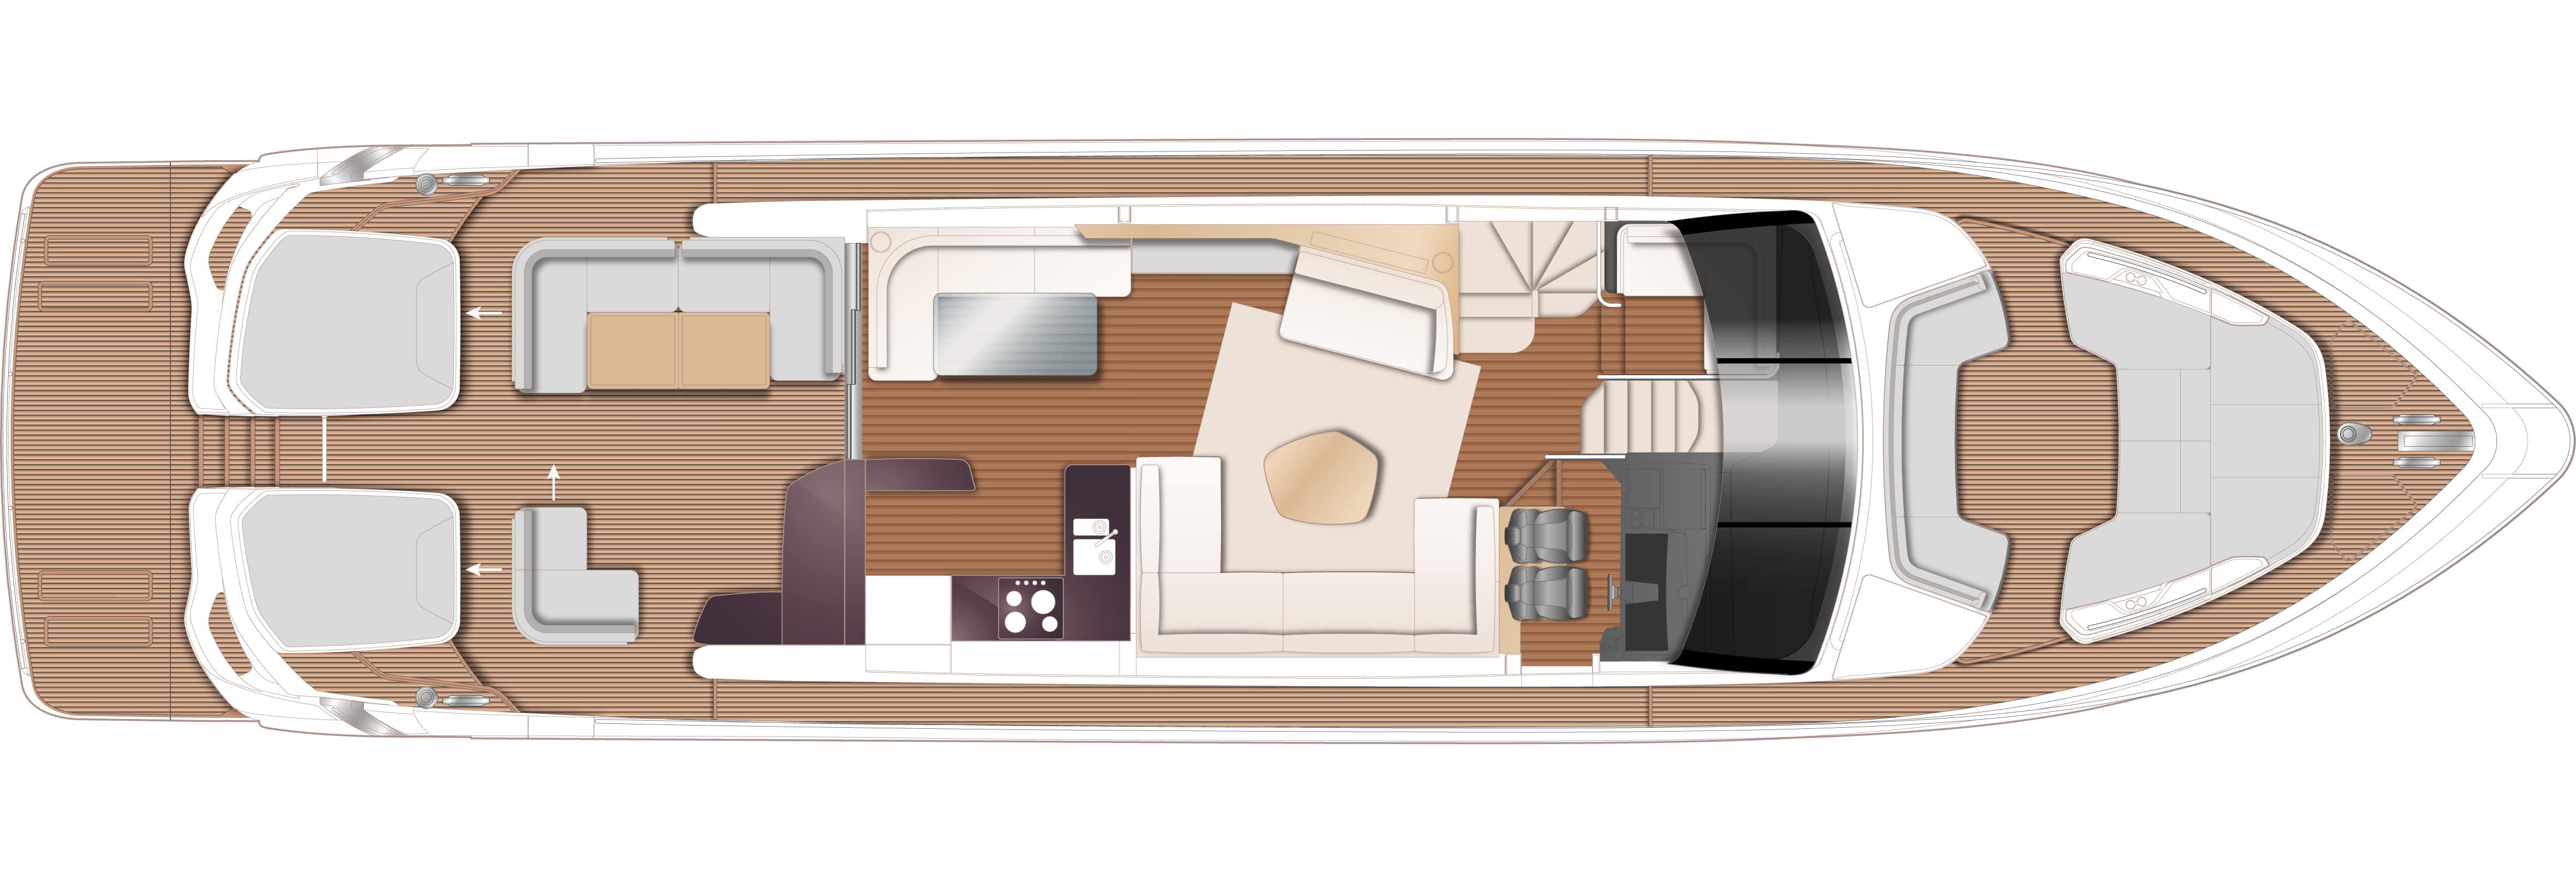 v78 layout main deck